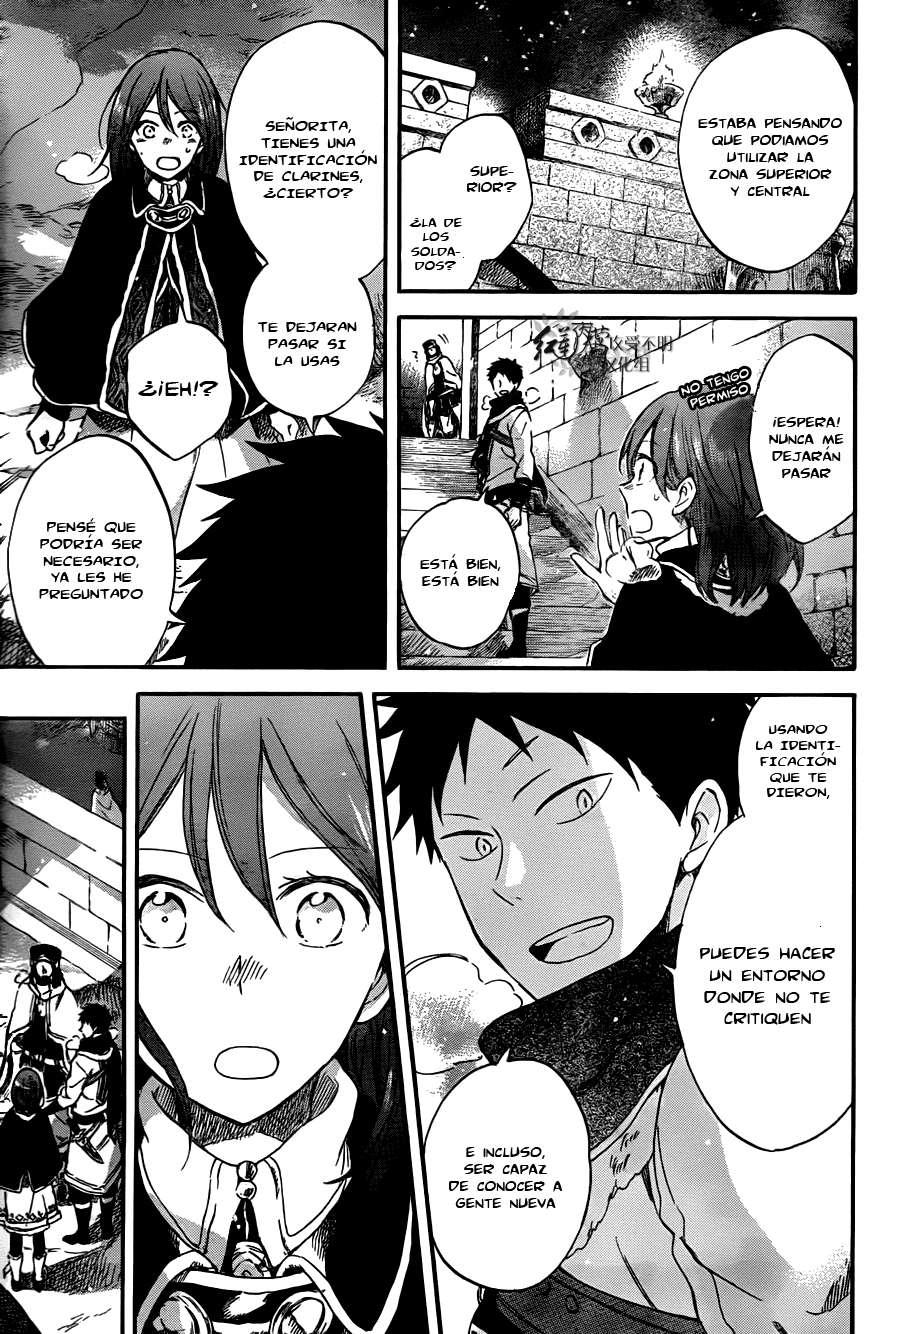 https://c5.ninemanga.com/es_manga/12/16588/399294/dc7f605c3d0c3c0fcc41b1ee5f494e5d.jpg Page 4